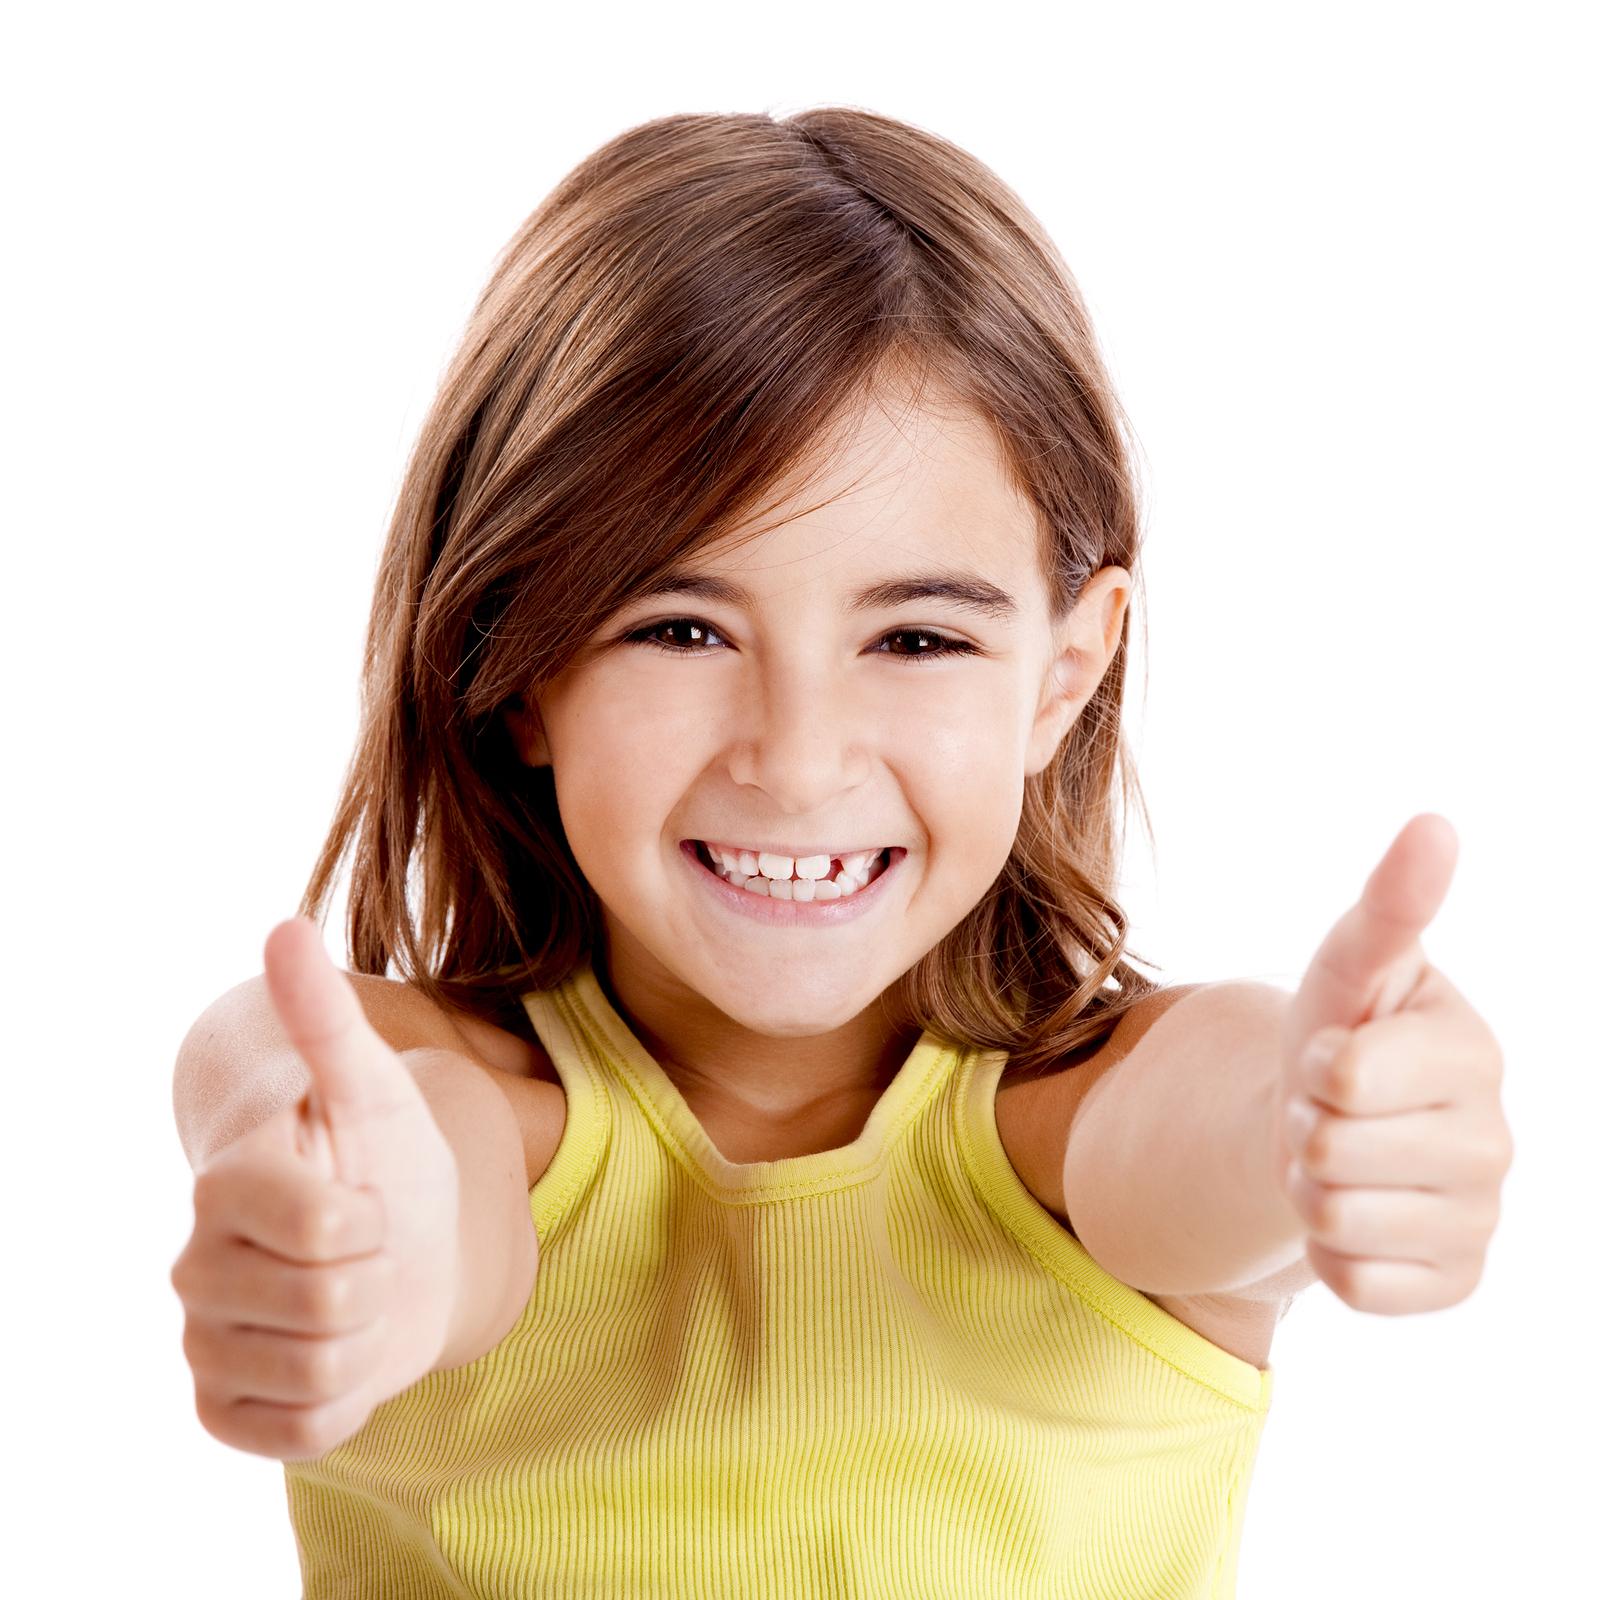 Brampton Dentists, Top Dentist in Brampton, Healthy Smiles, Dental Programs Ontario, Children's Dental Care, Free Dental Programs Ontario, Dental Health,